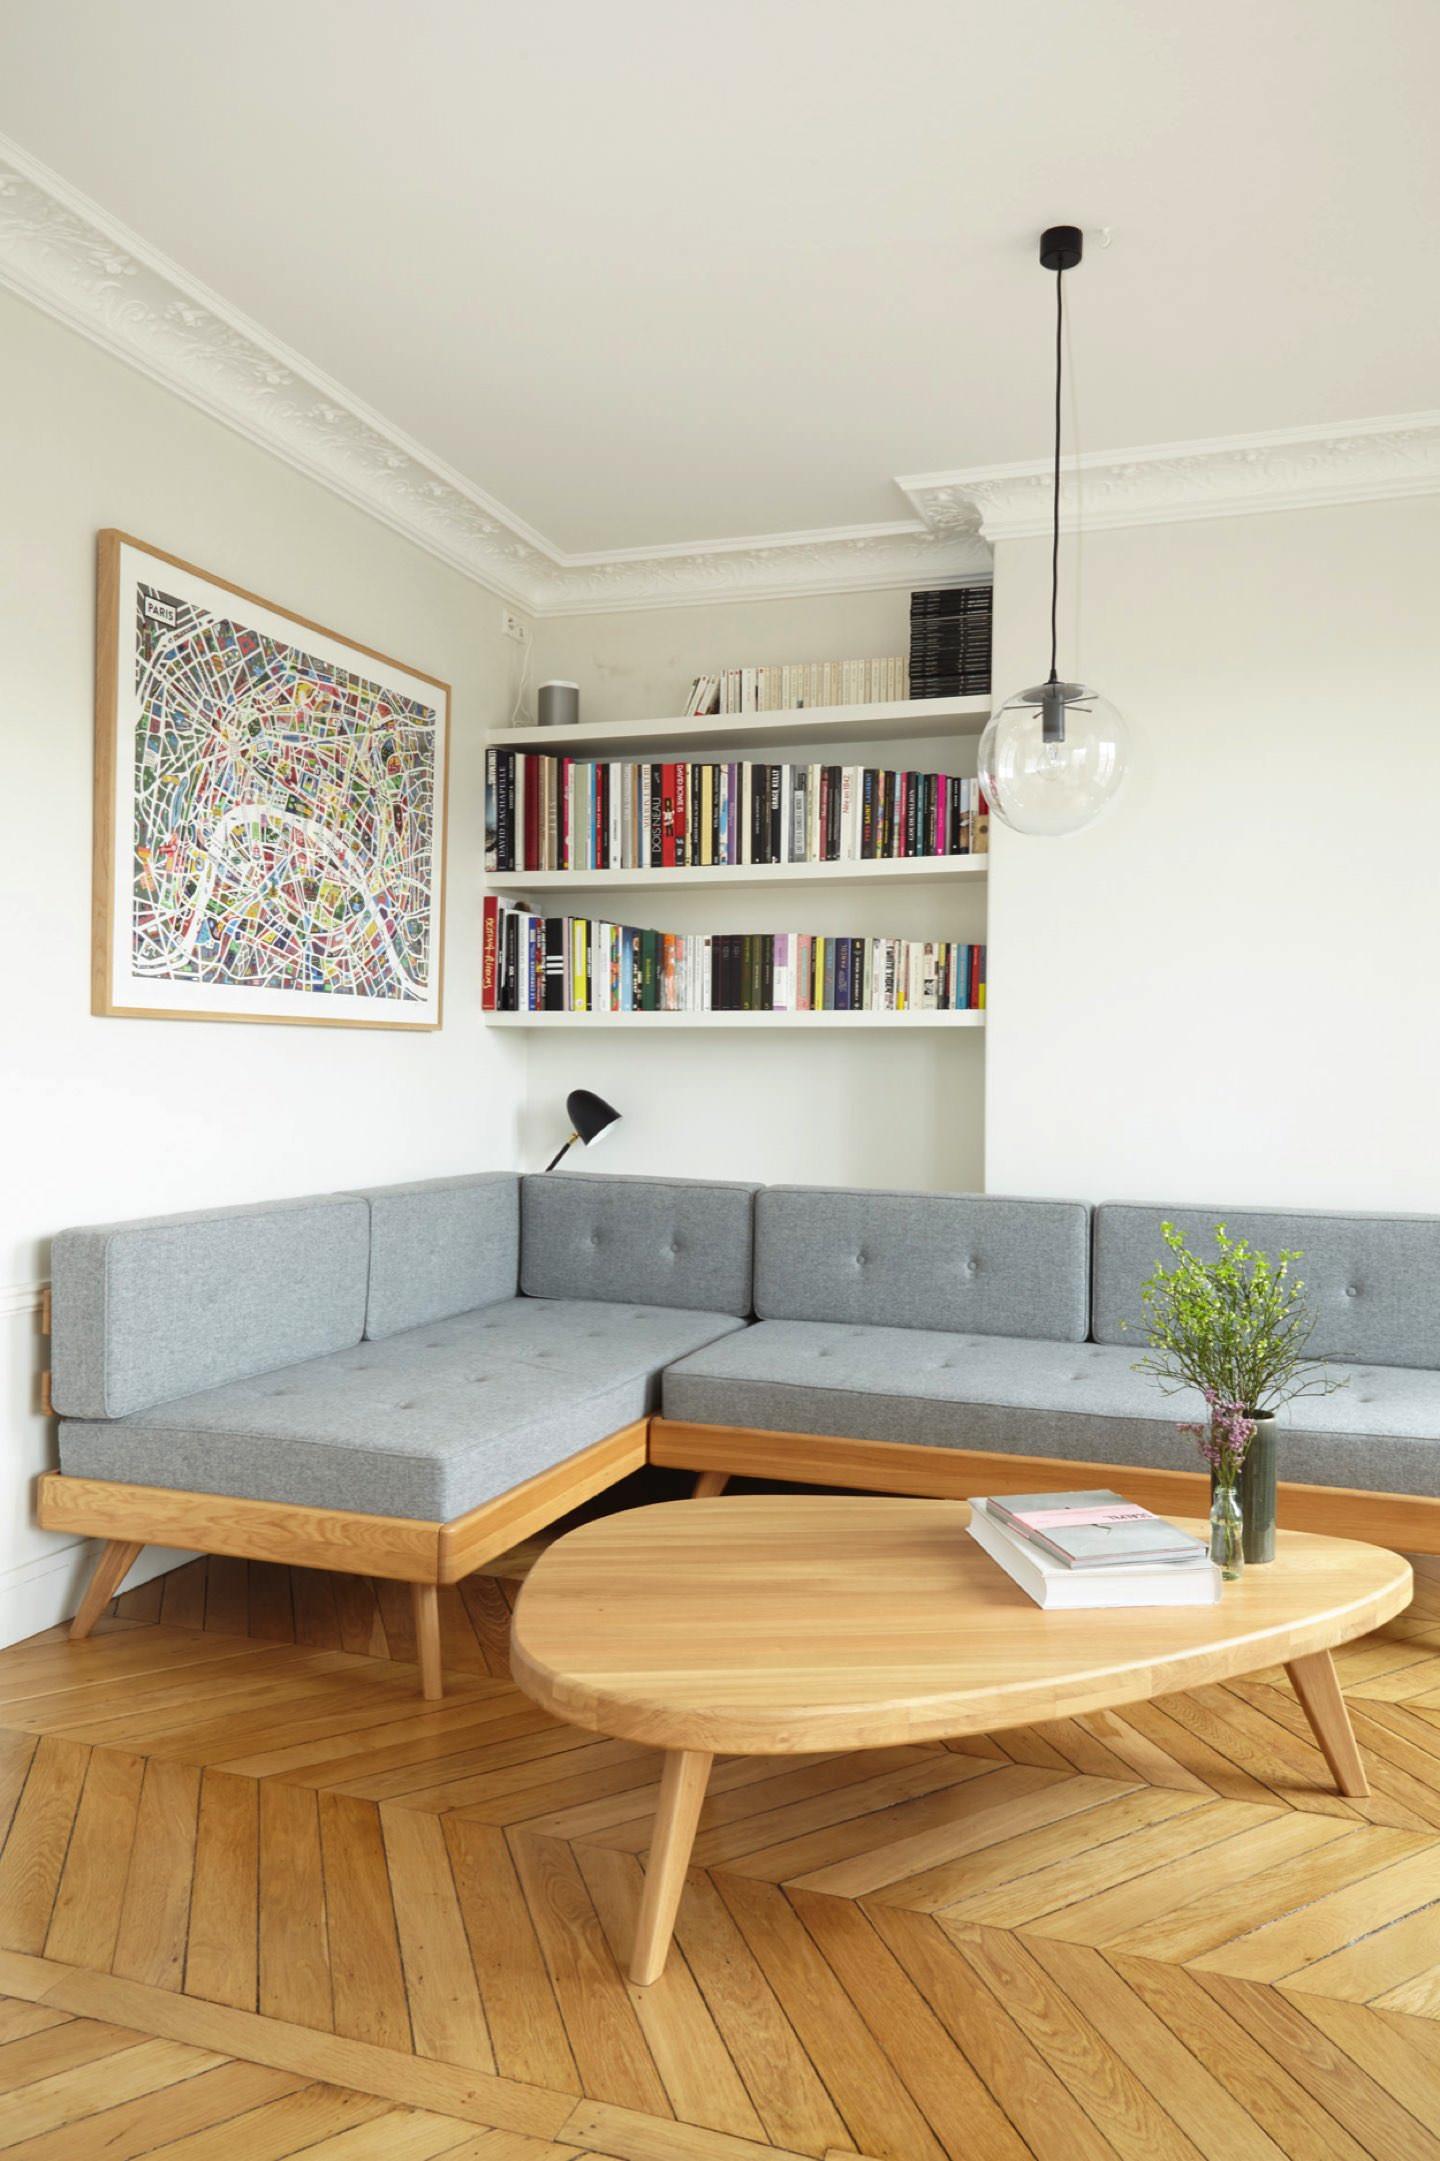 appartement-montmartre-gesa-hansen-2